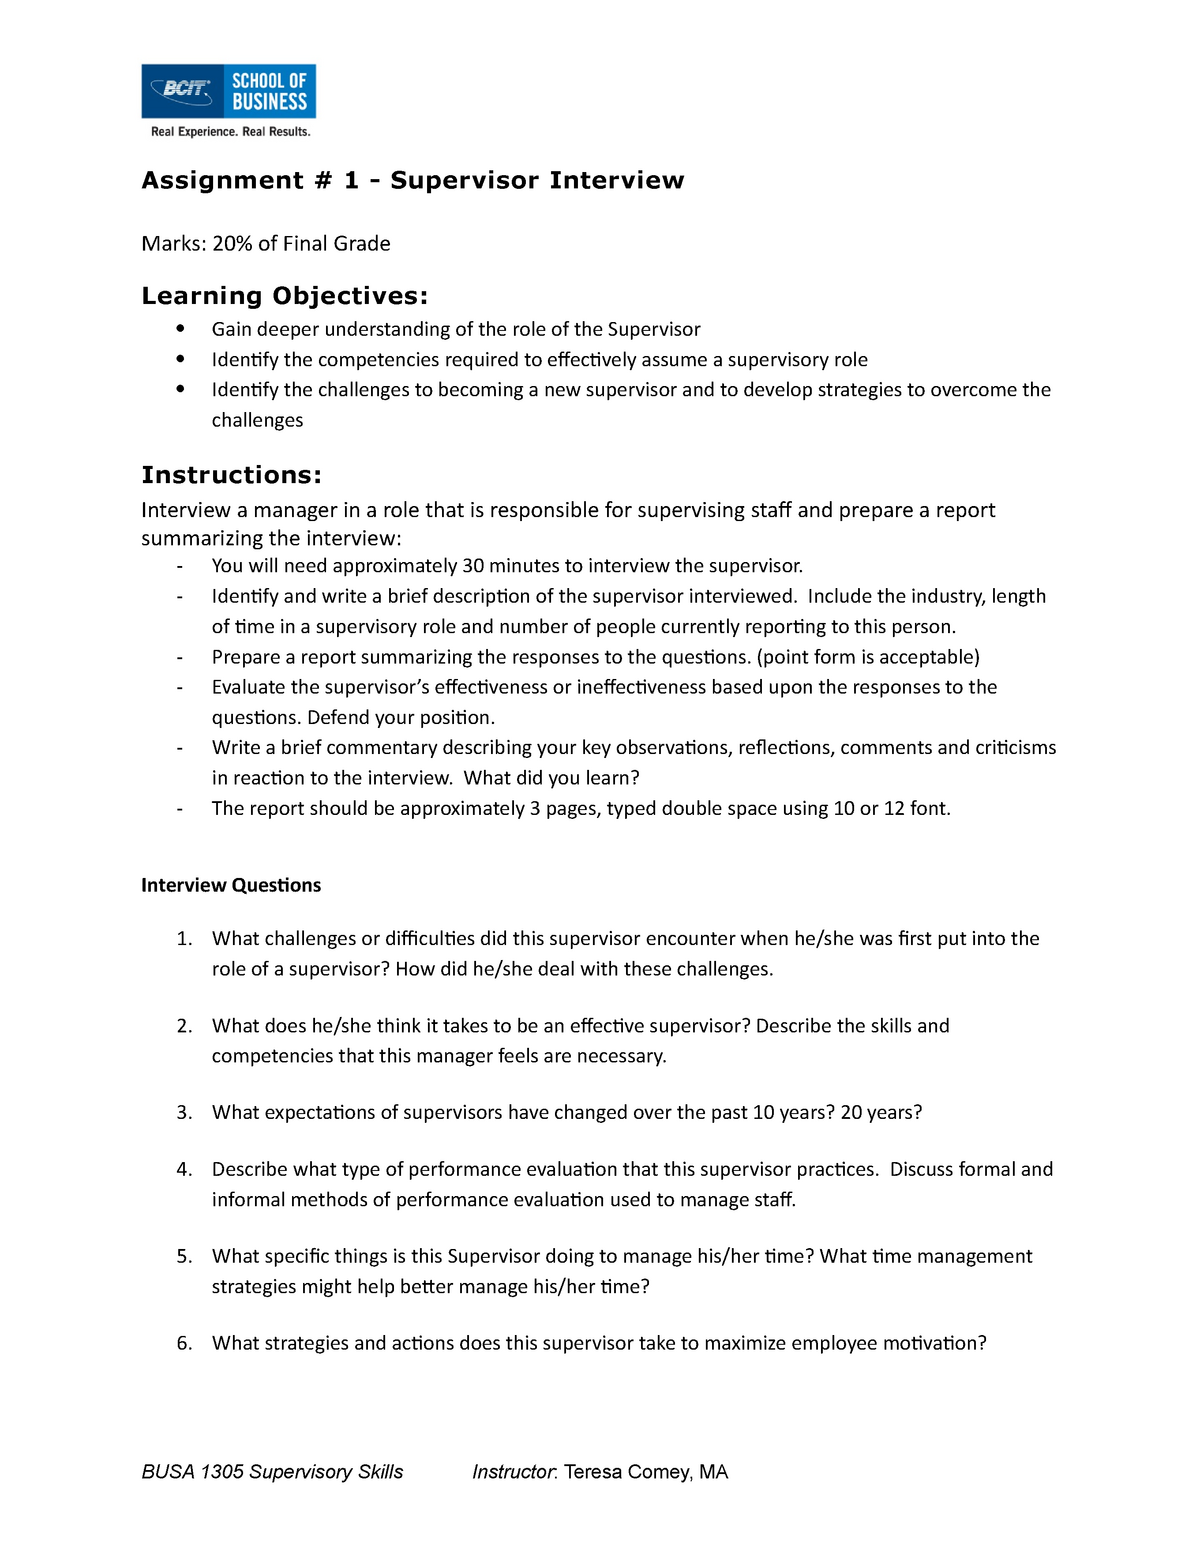 Seminar Assignments, Supervisor Interview - BUSA 1305